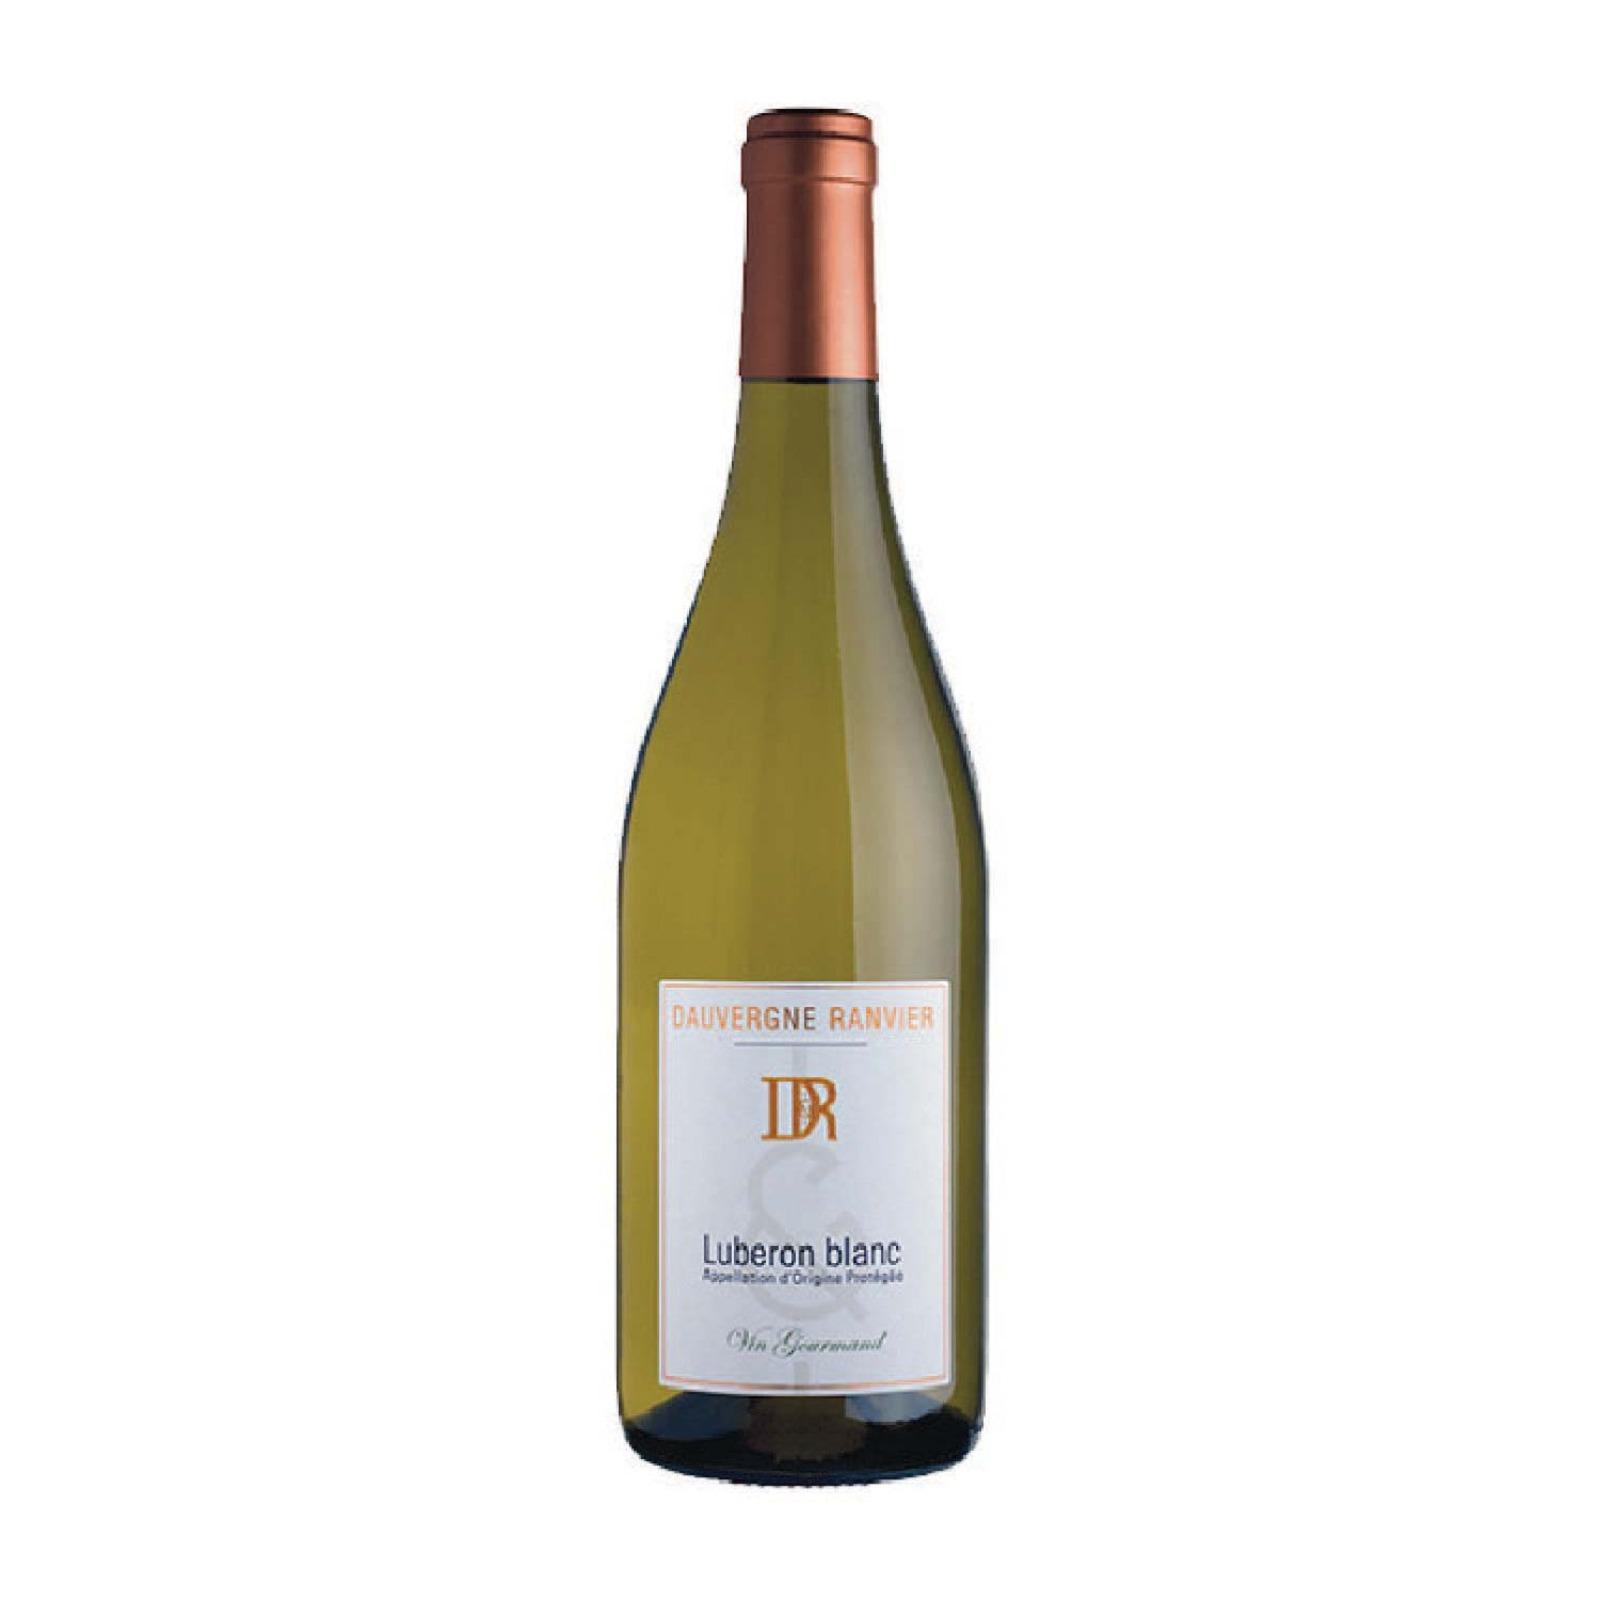 Dauvergne-Ranvier Luberon Blanc Vin Gourmand